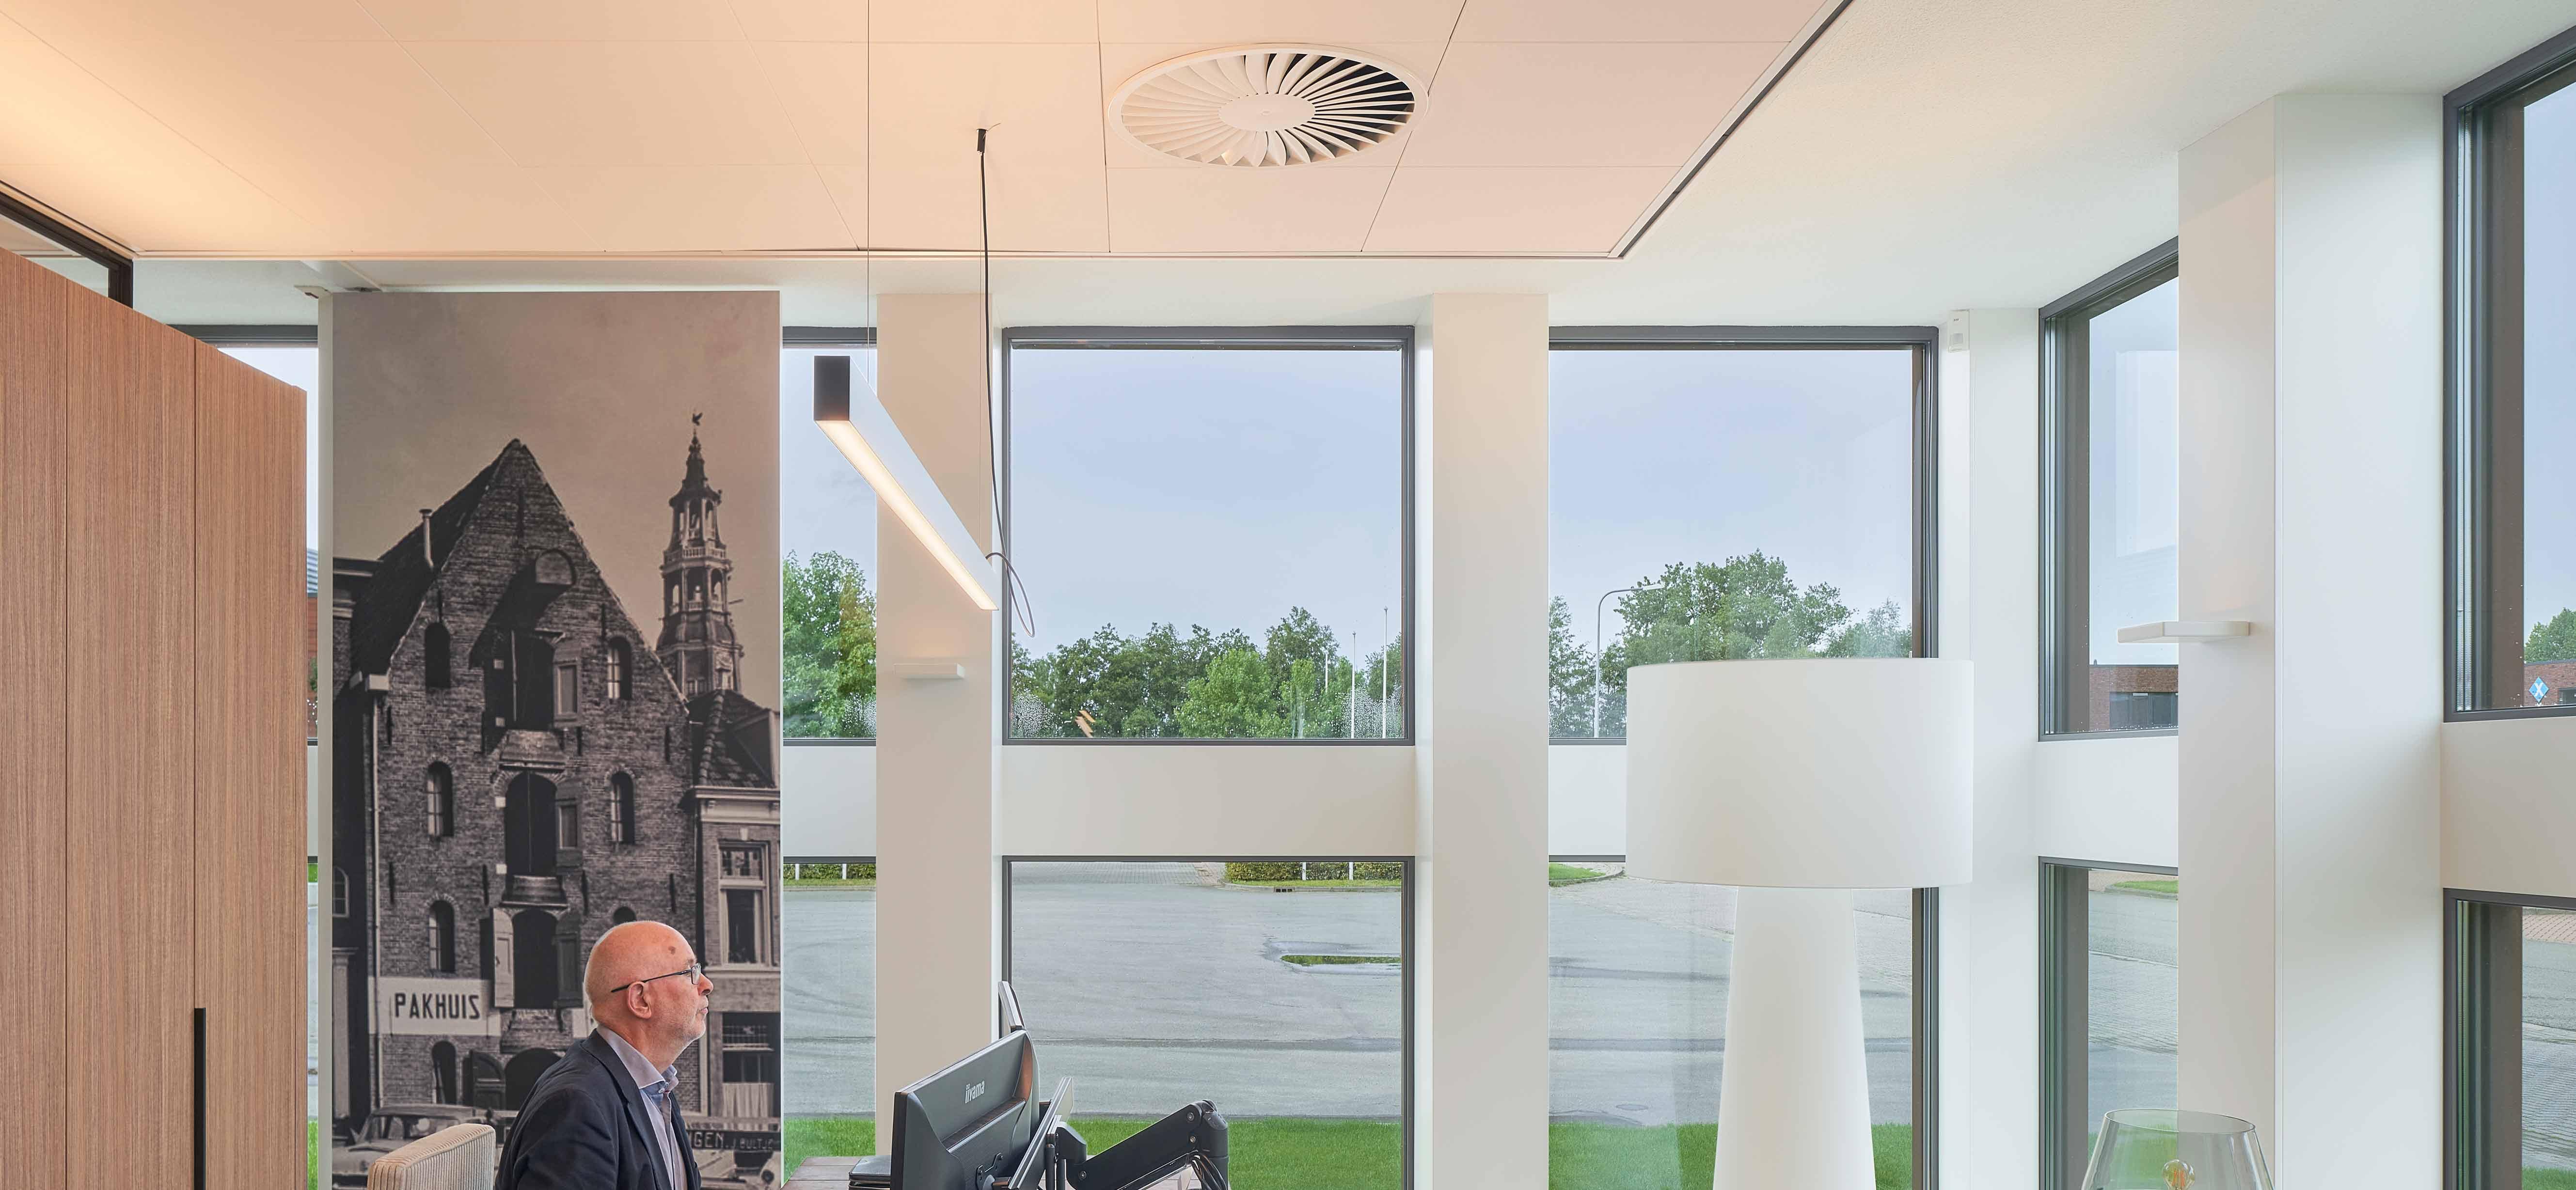 319.1-Office-NNZ,-architecture-by-Team4,-interior-by-Buro-Bulder,-photography-by-Gerard-van-Beek---FritsJurgens-System-M-pivot-hinge-systems.jpg